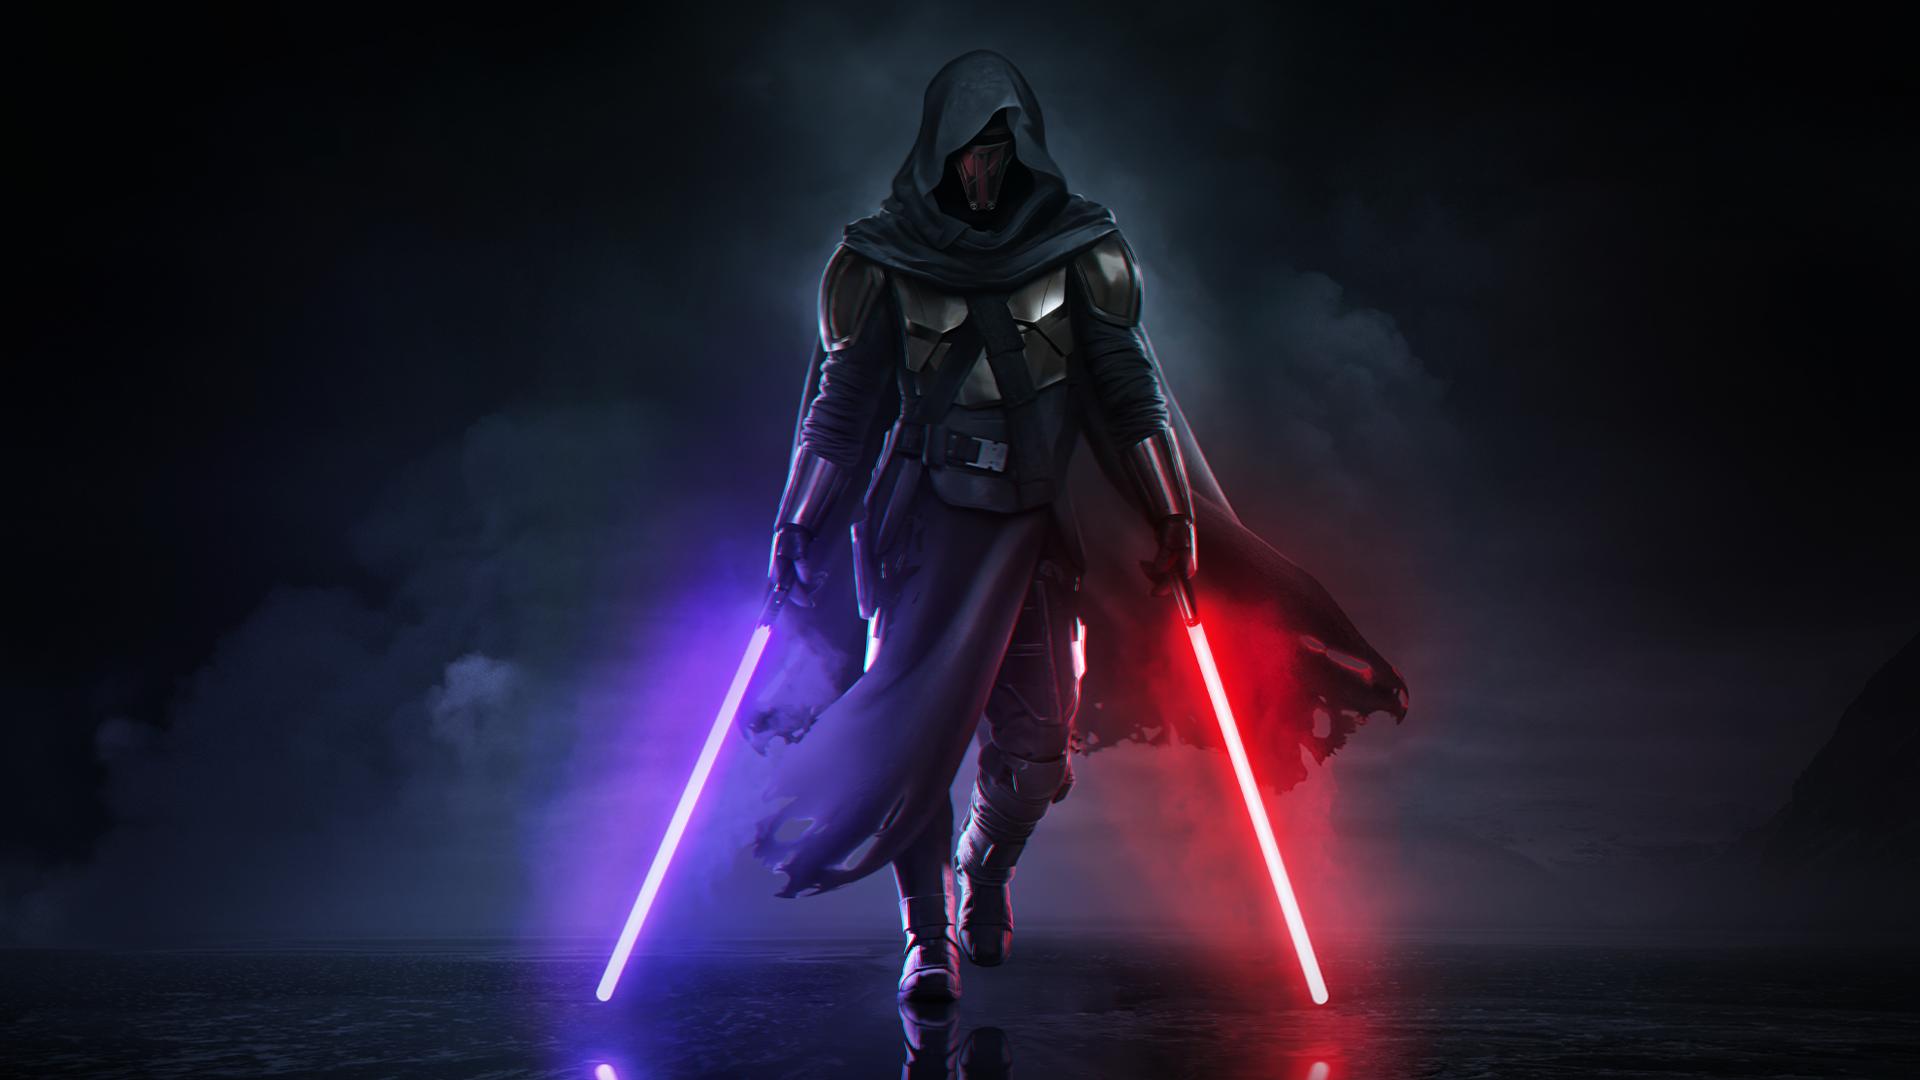 General 1920x1080 Darth Revan Star Wars purple light lightsaber